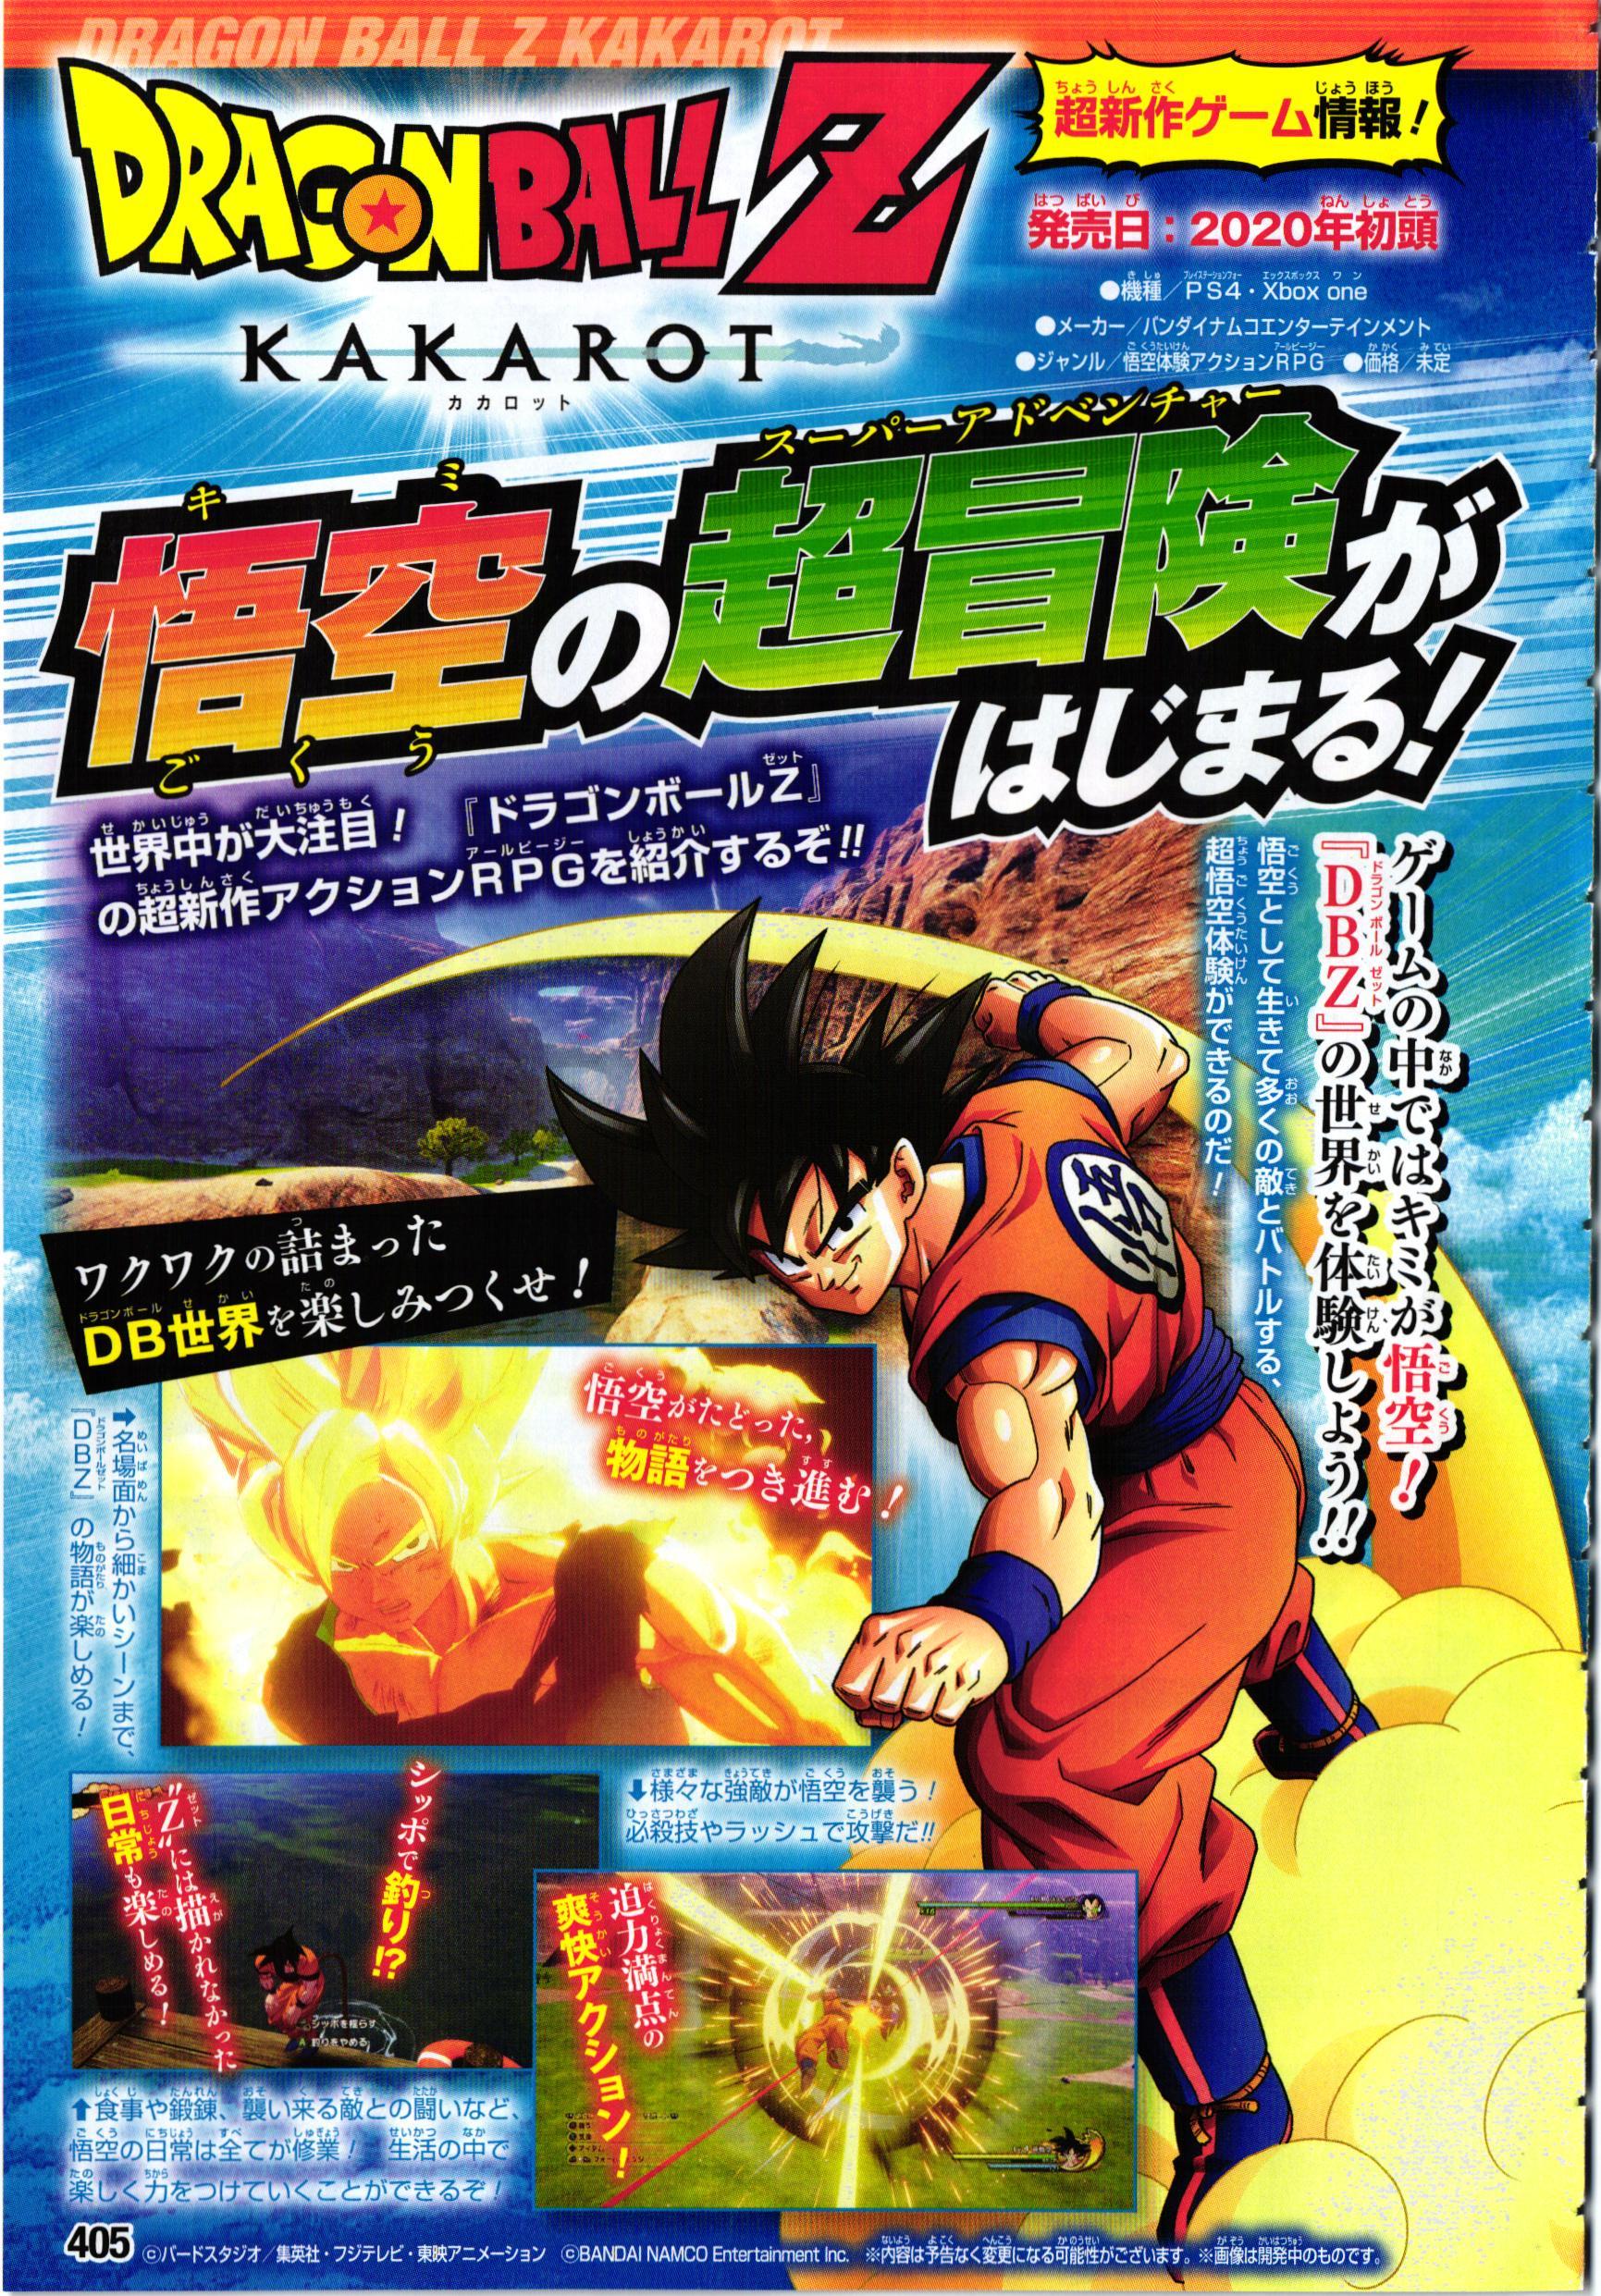 Dragon Ball Z Kakarot : Nouvelles images dans le Saikyo Jump